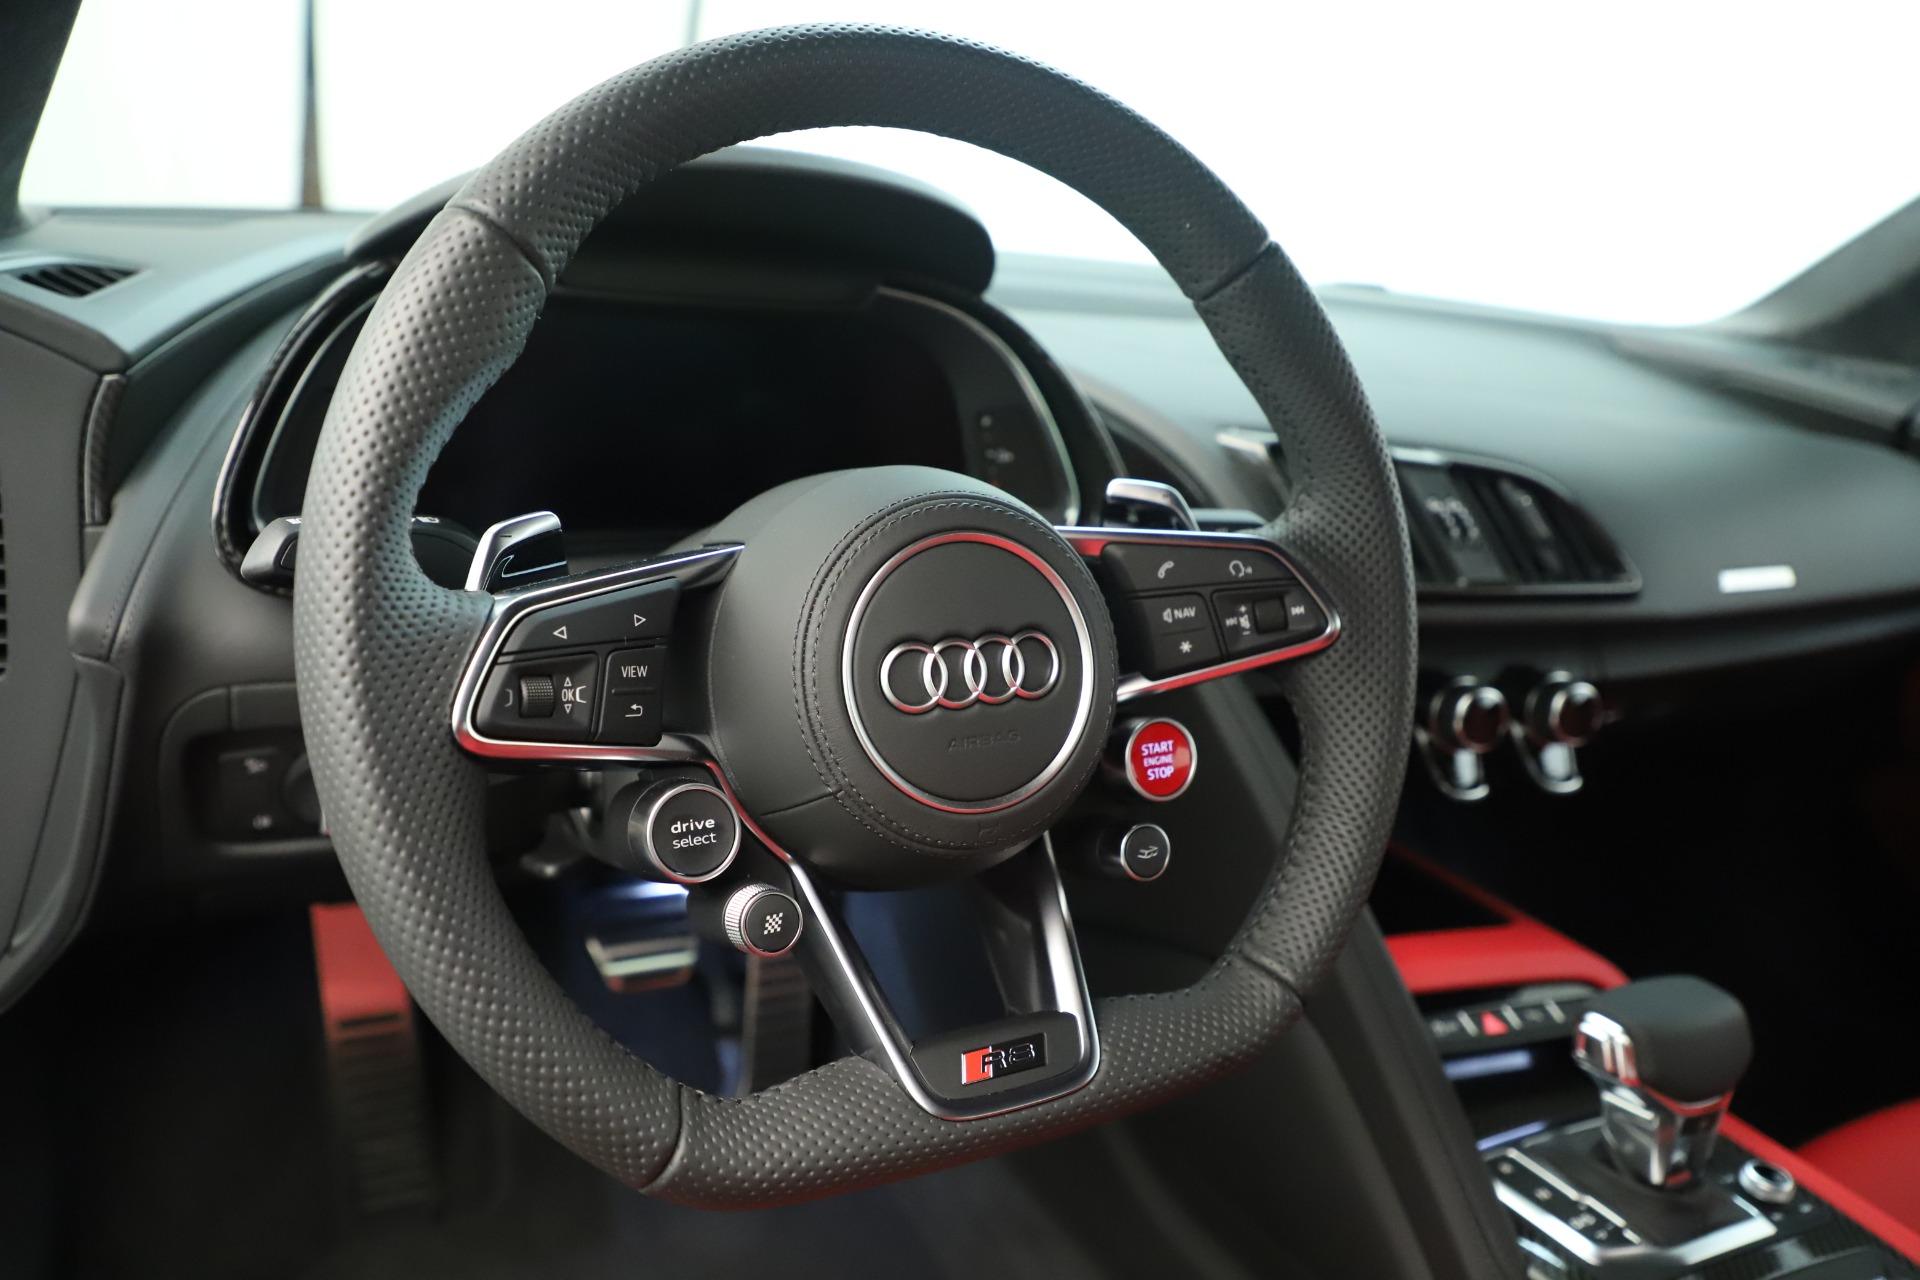 Used 2018 Audi R8 5.2 quattro V10 Plus For Sale In Greenwich, CT 3360_p21